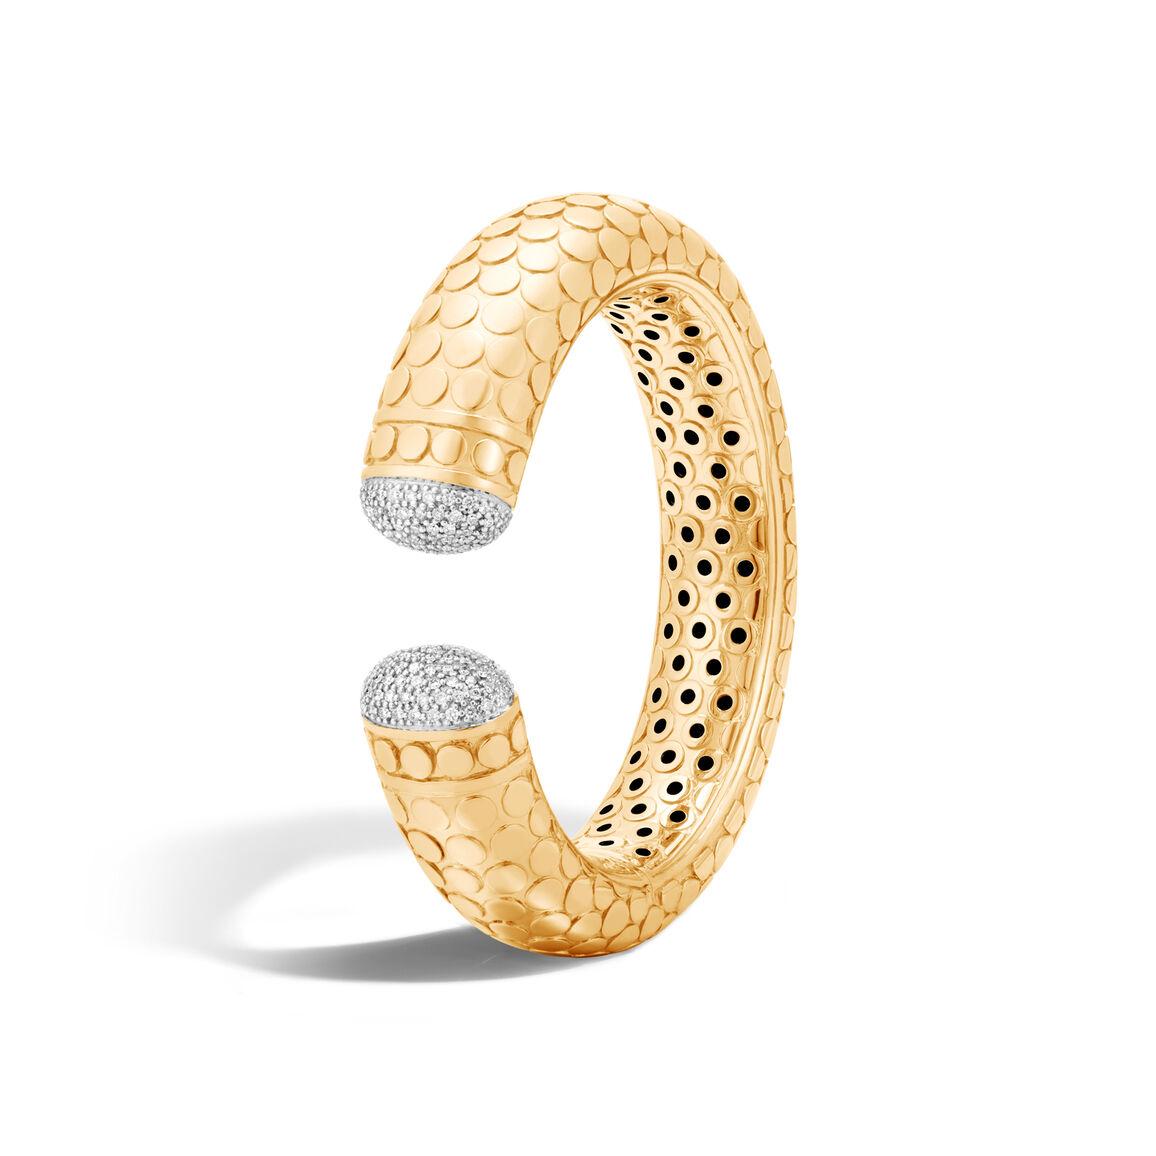 Dot 17.5MM Kick Cuff in 18K Gold with Diamonds